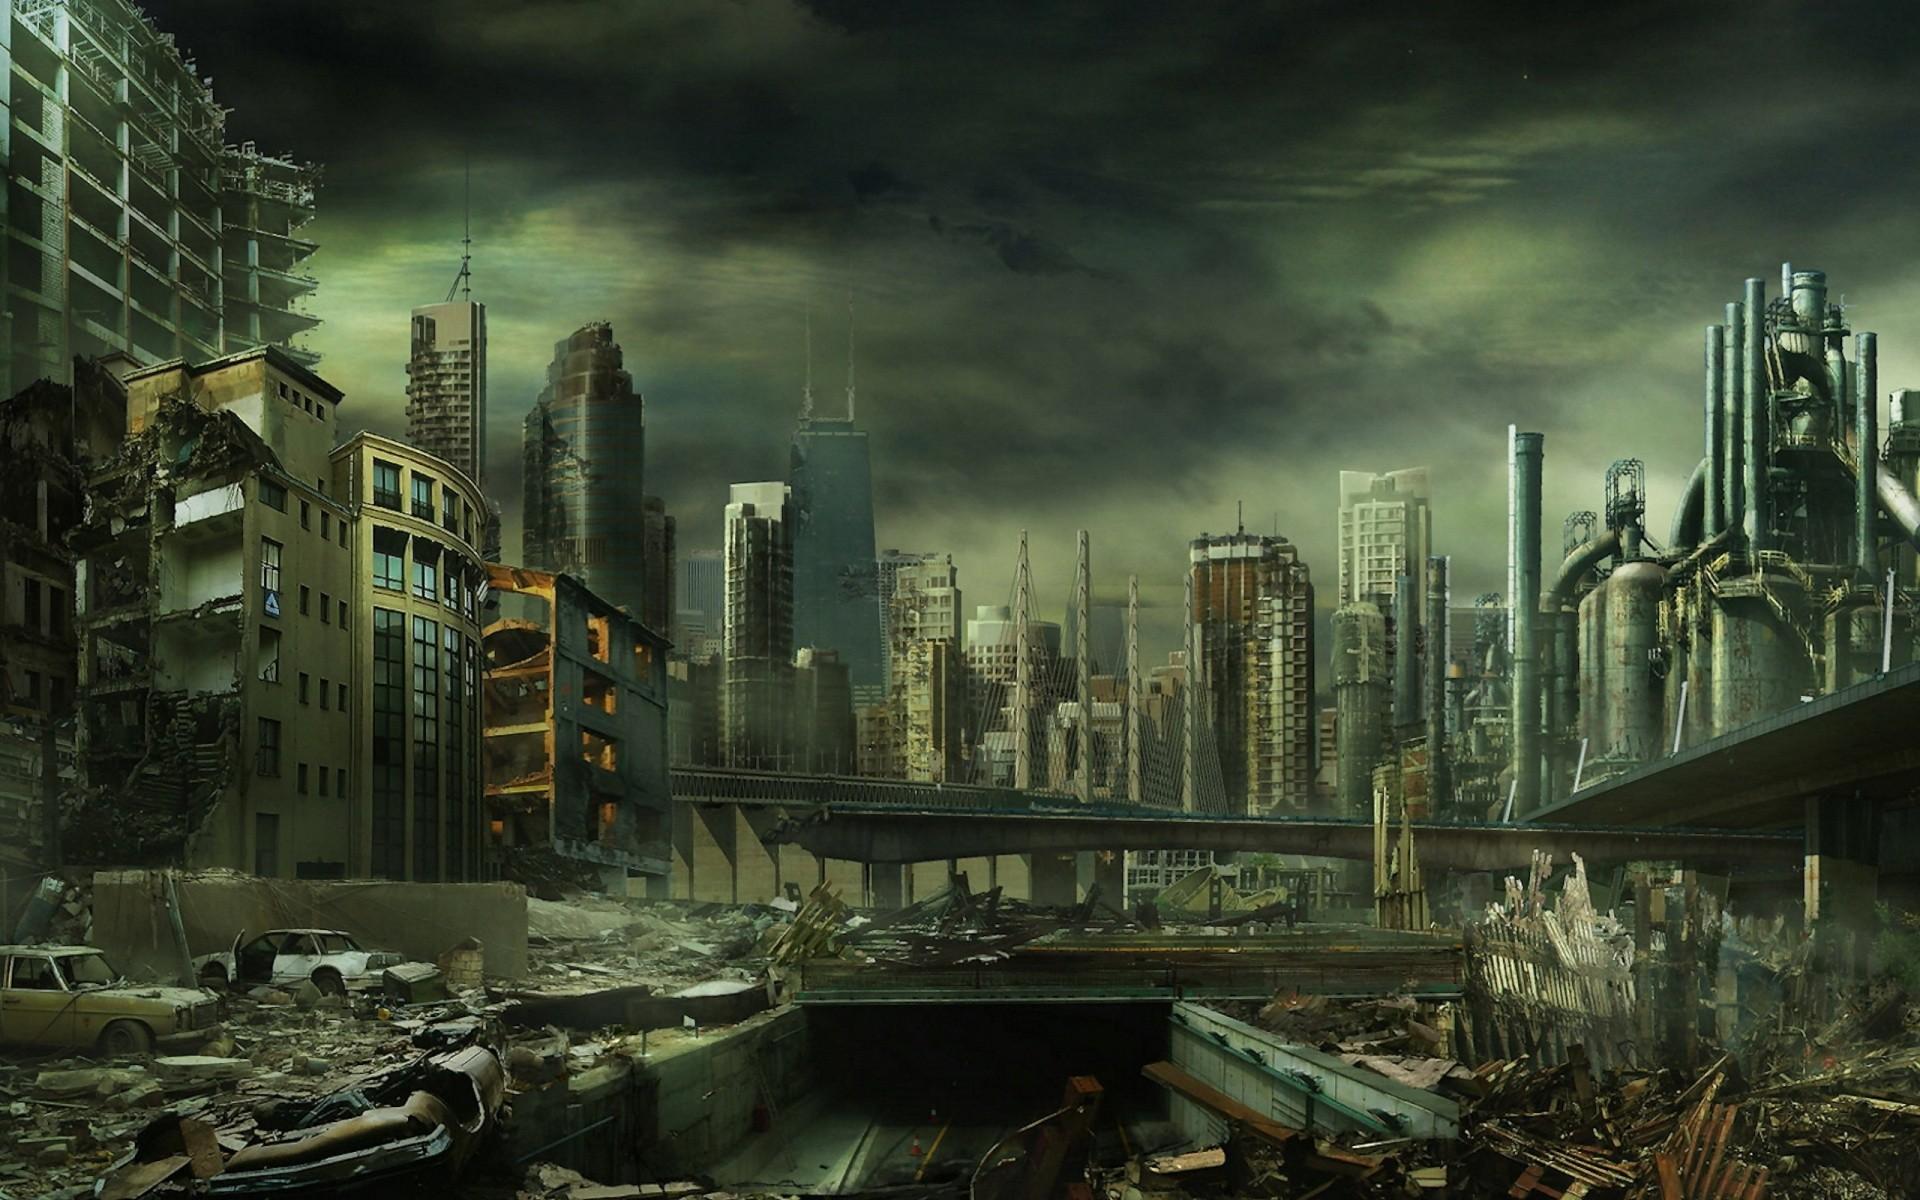 Amazing Wallpaper City Background - 73106  Photograph_518343 .jpg